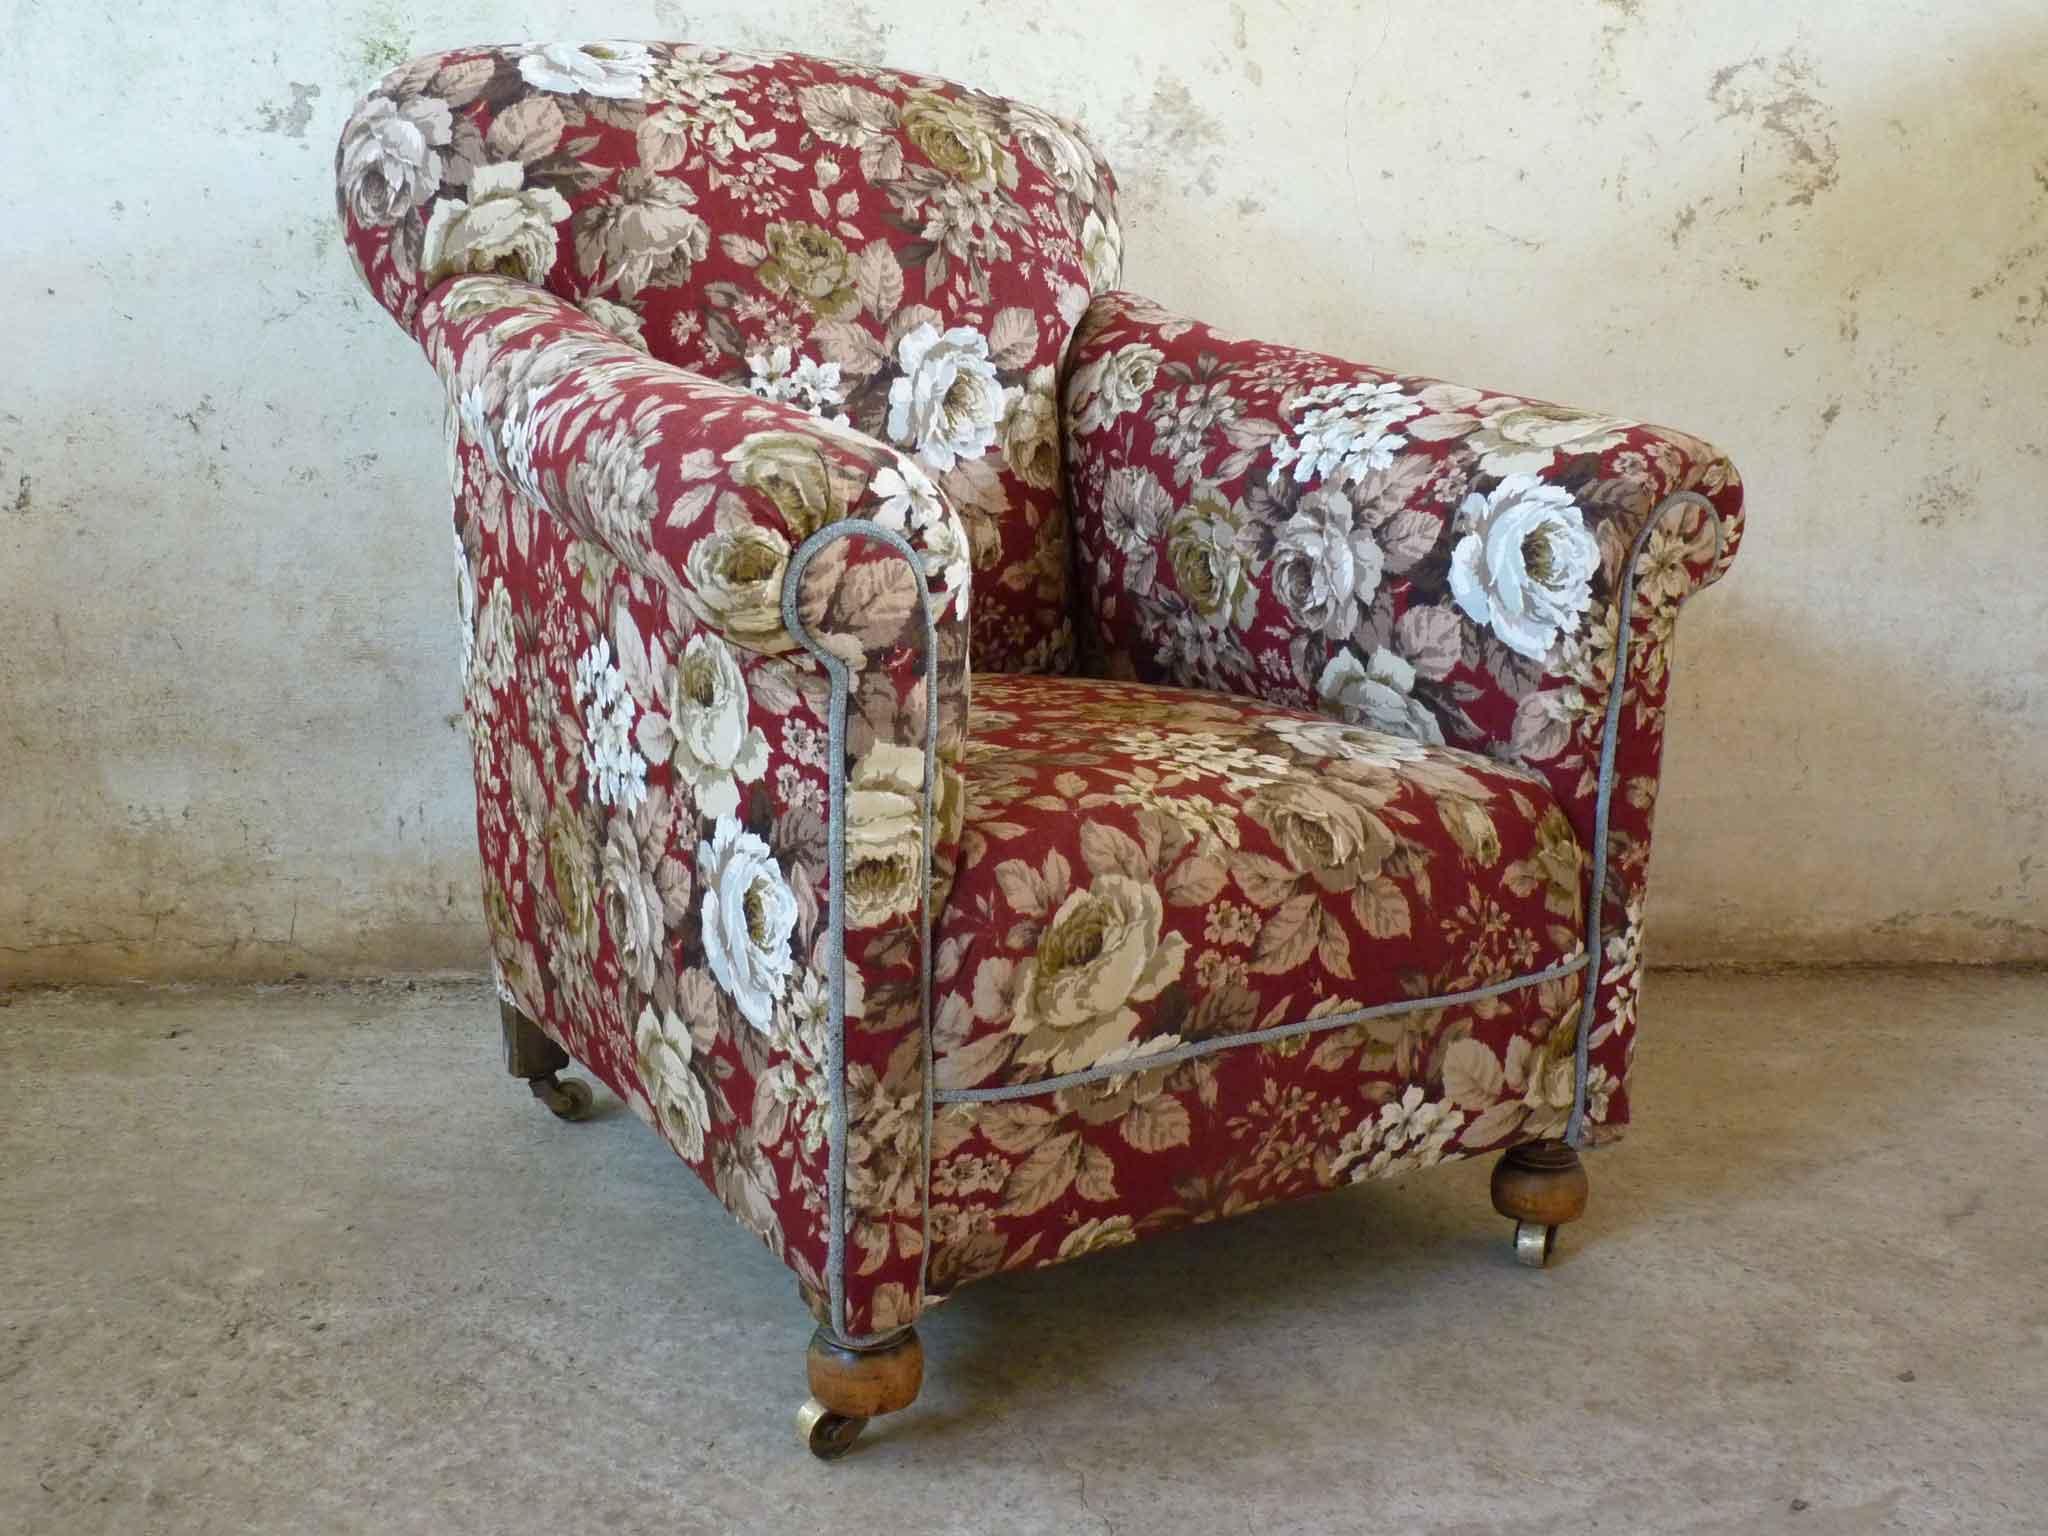 Early 20th century armchair